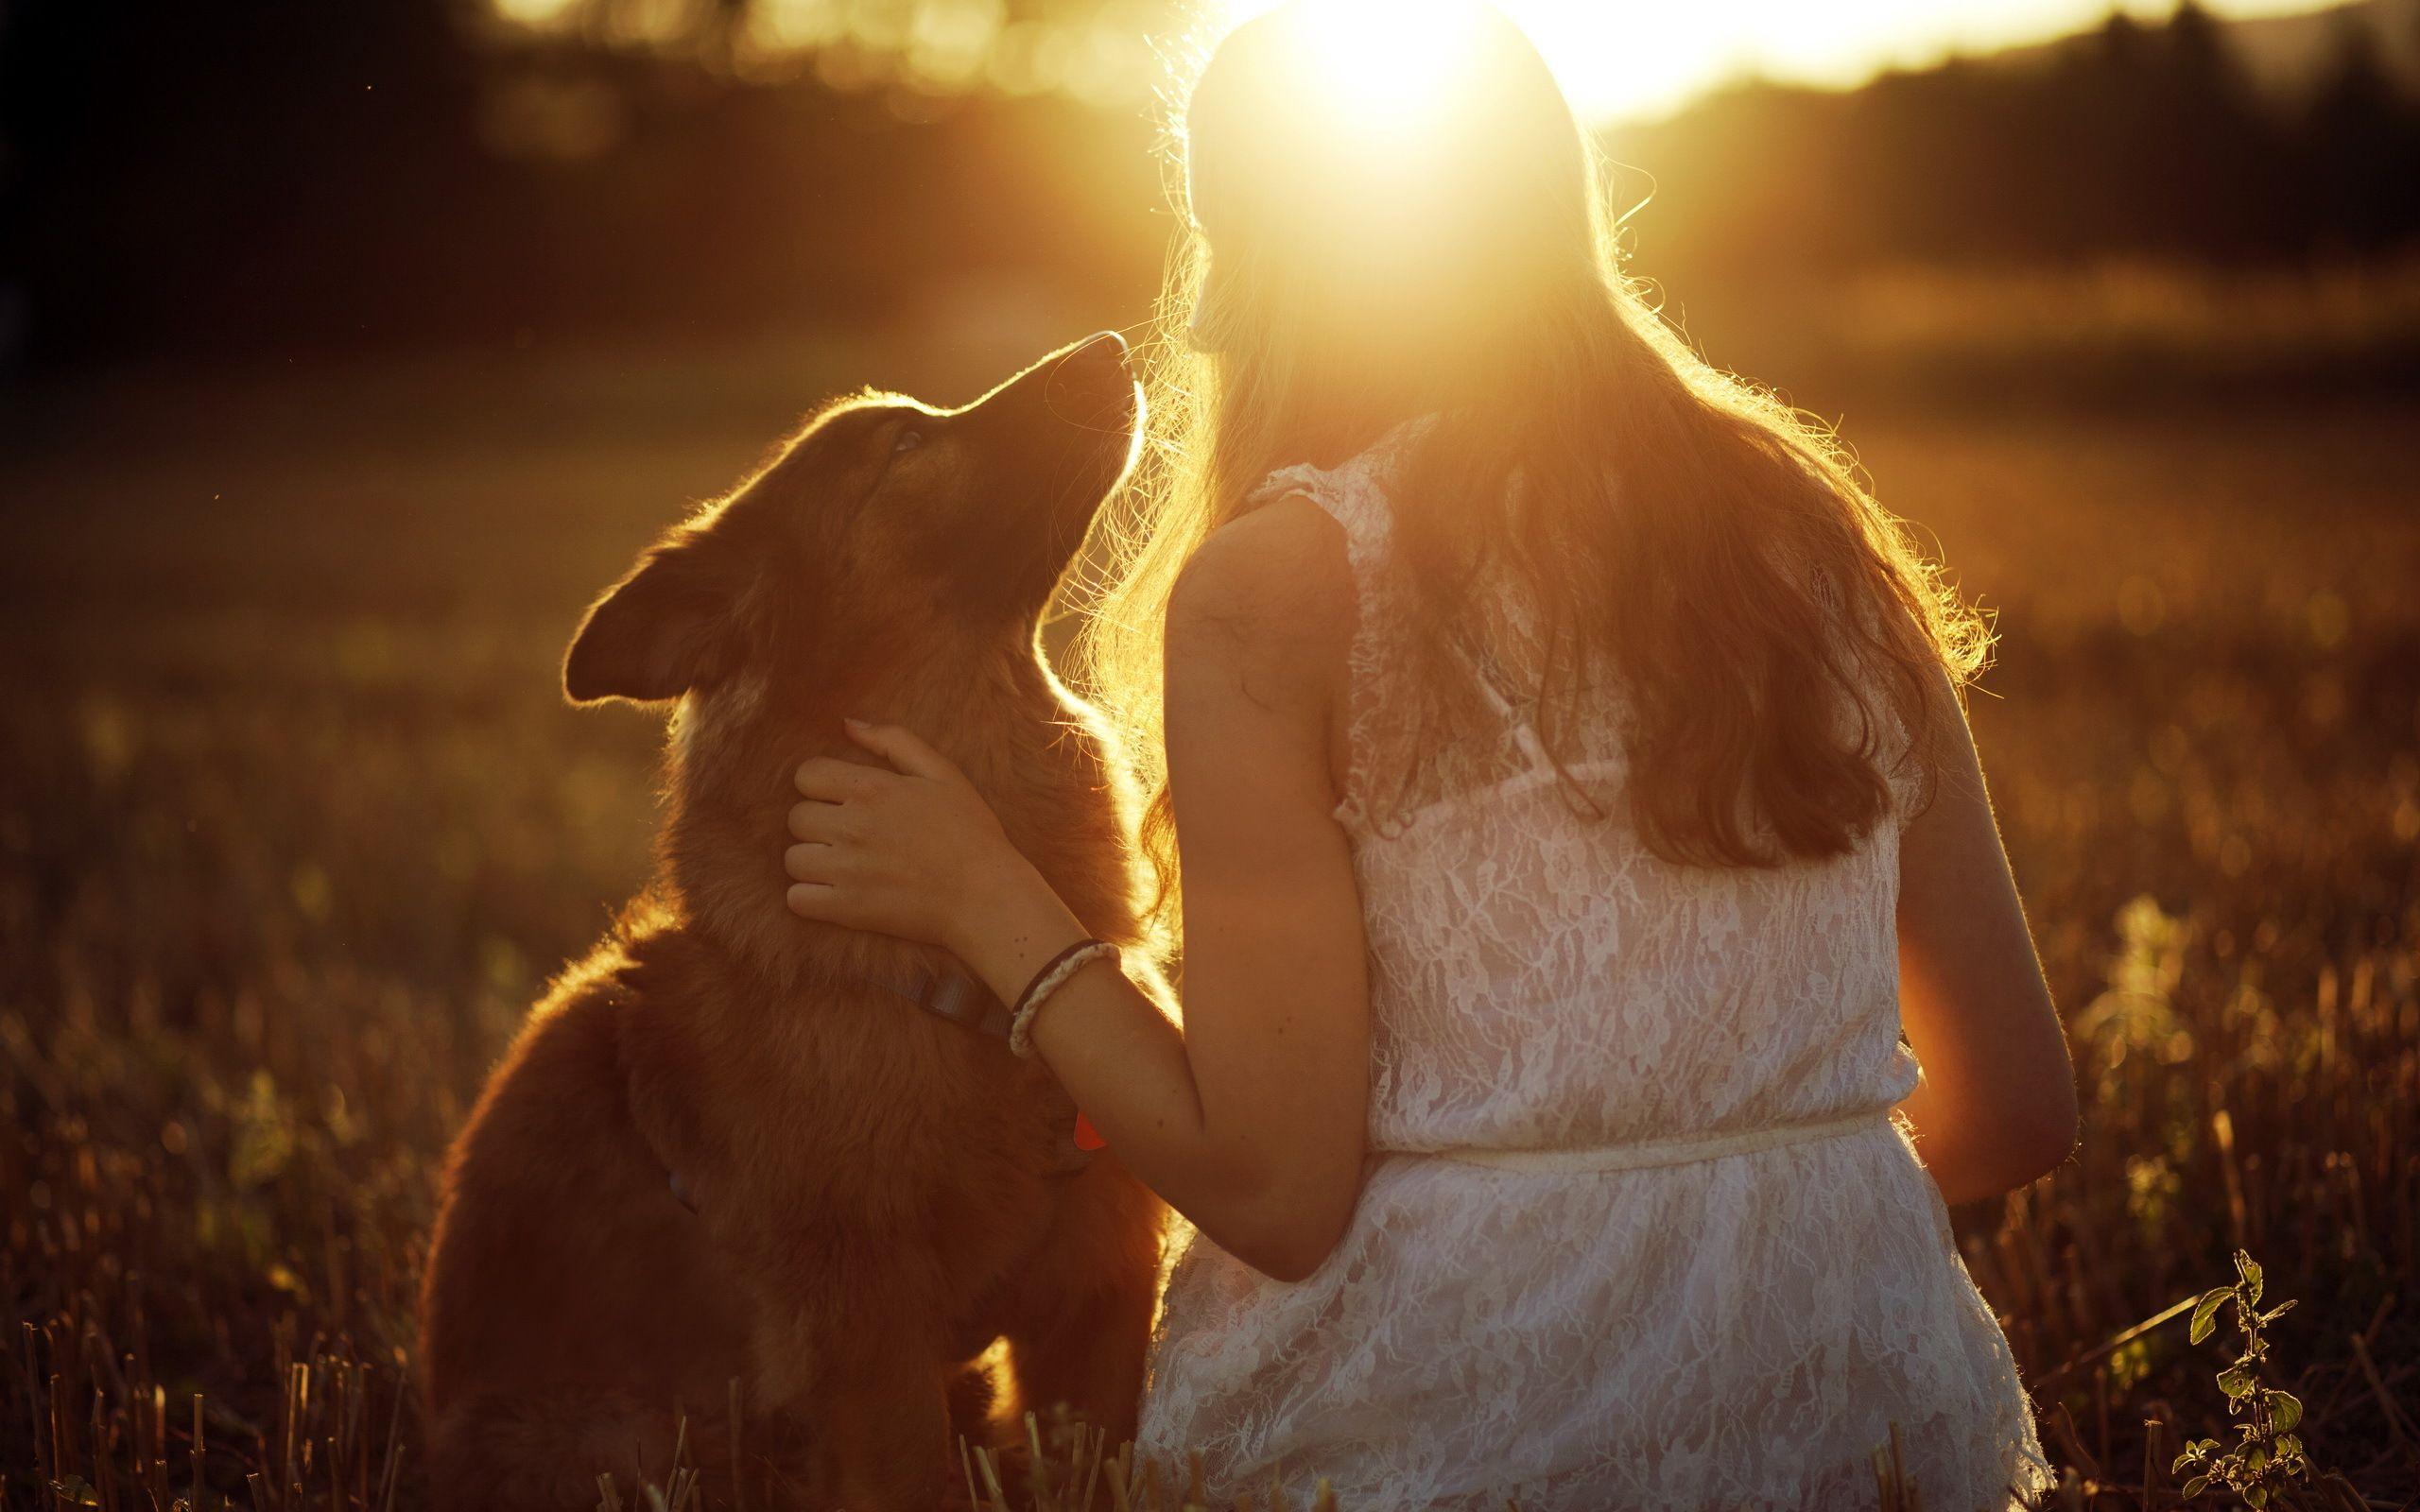 Download wallpaper girl, light, mood, dog, section mood in